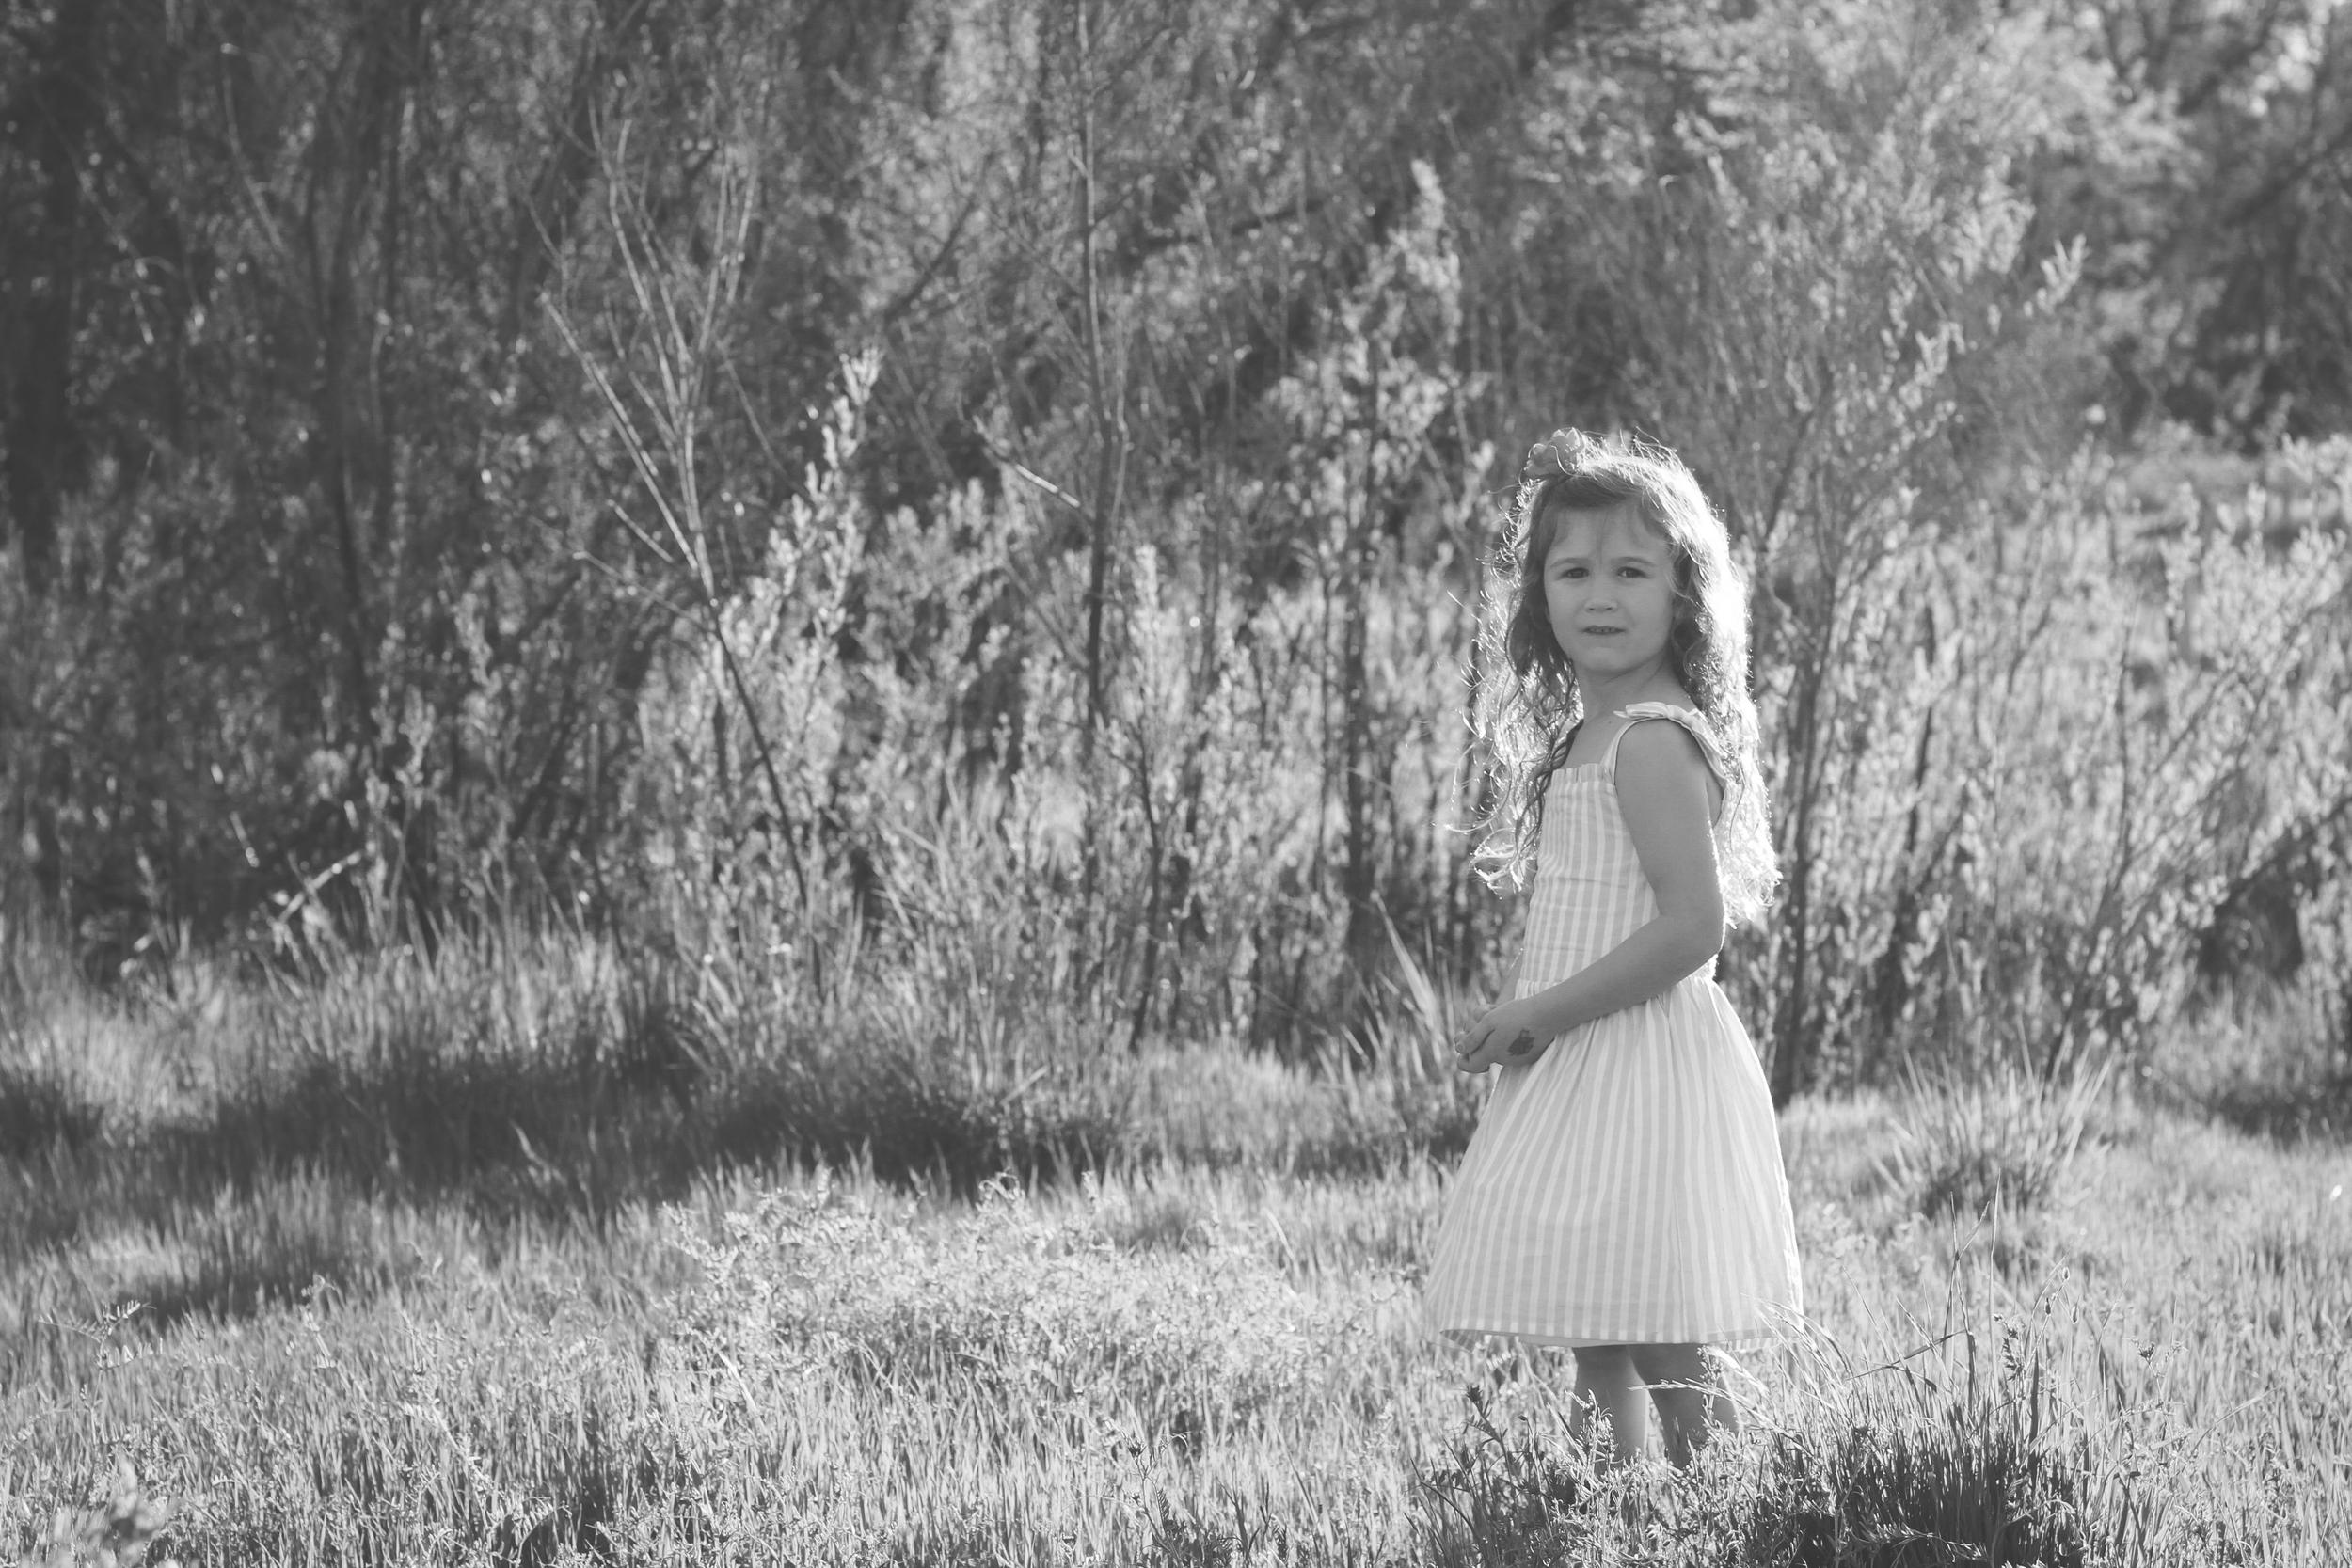 charissaannephotography-2977-2.jpg